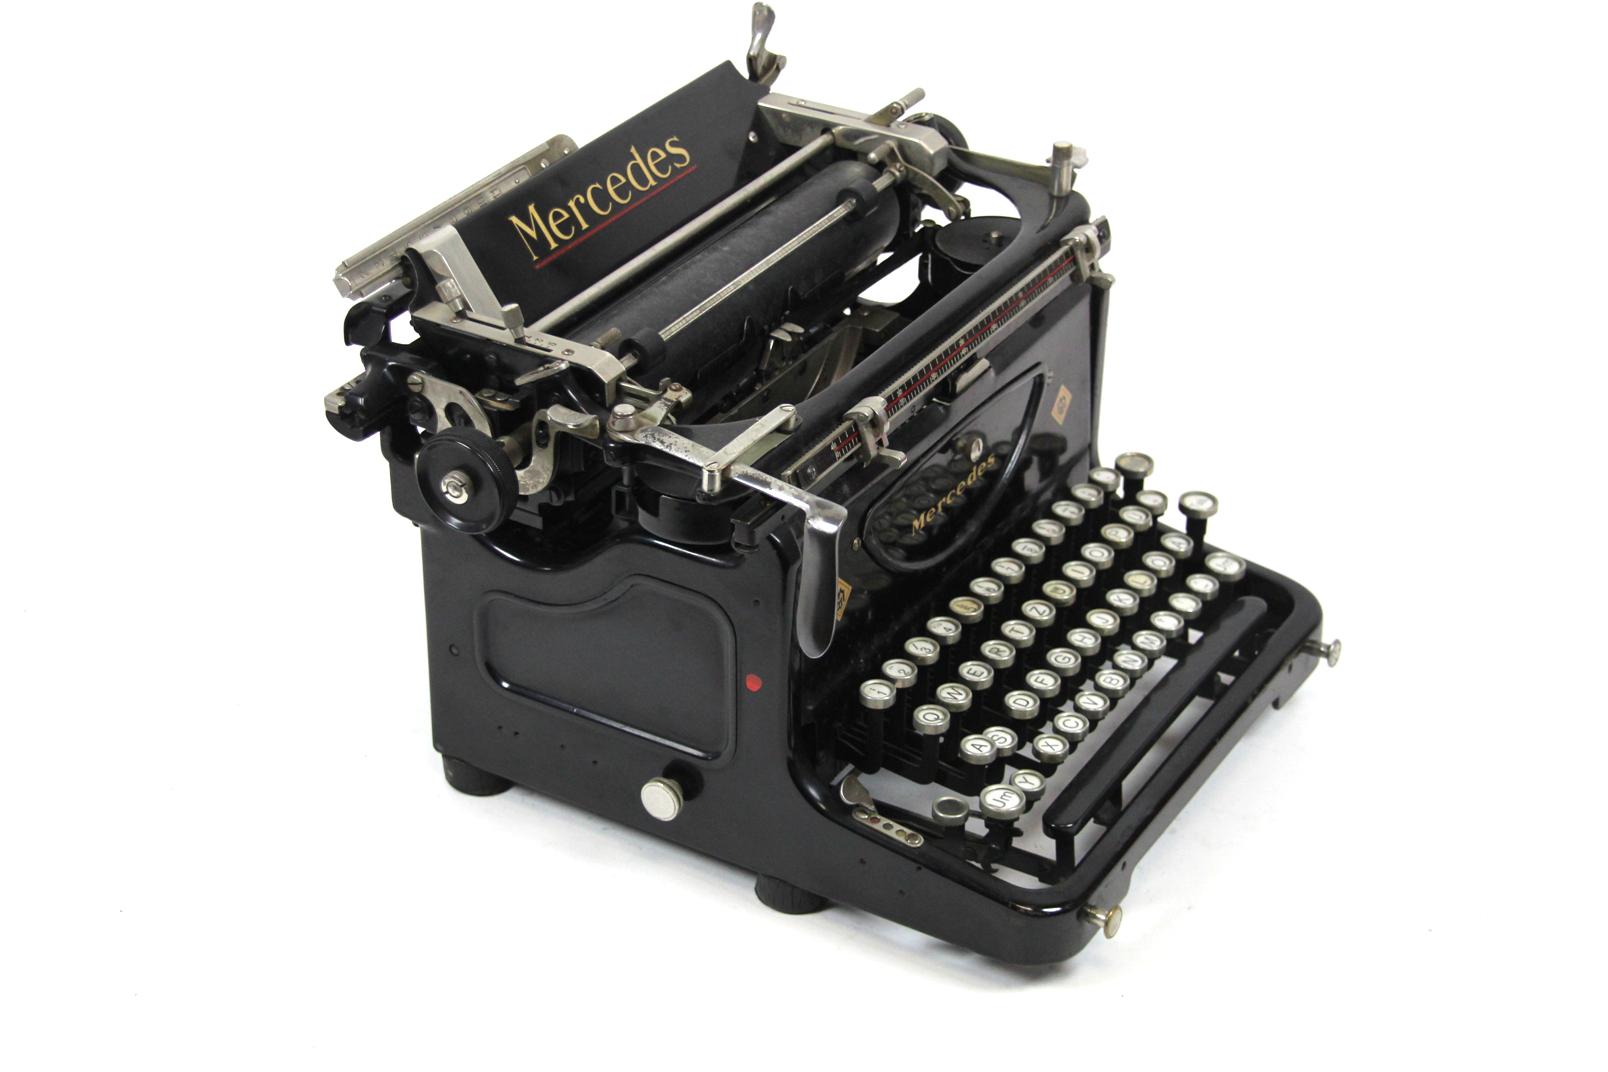 antike mercedes mod 3 schreibmaschine um 1920 zella. Black Bedroom Furniture Sets. Home Design Ideas